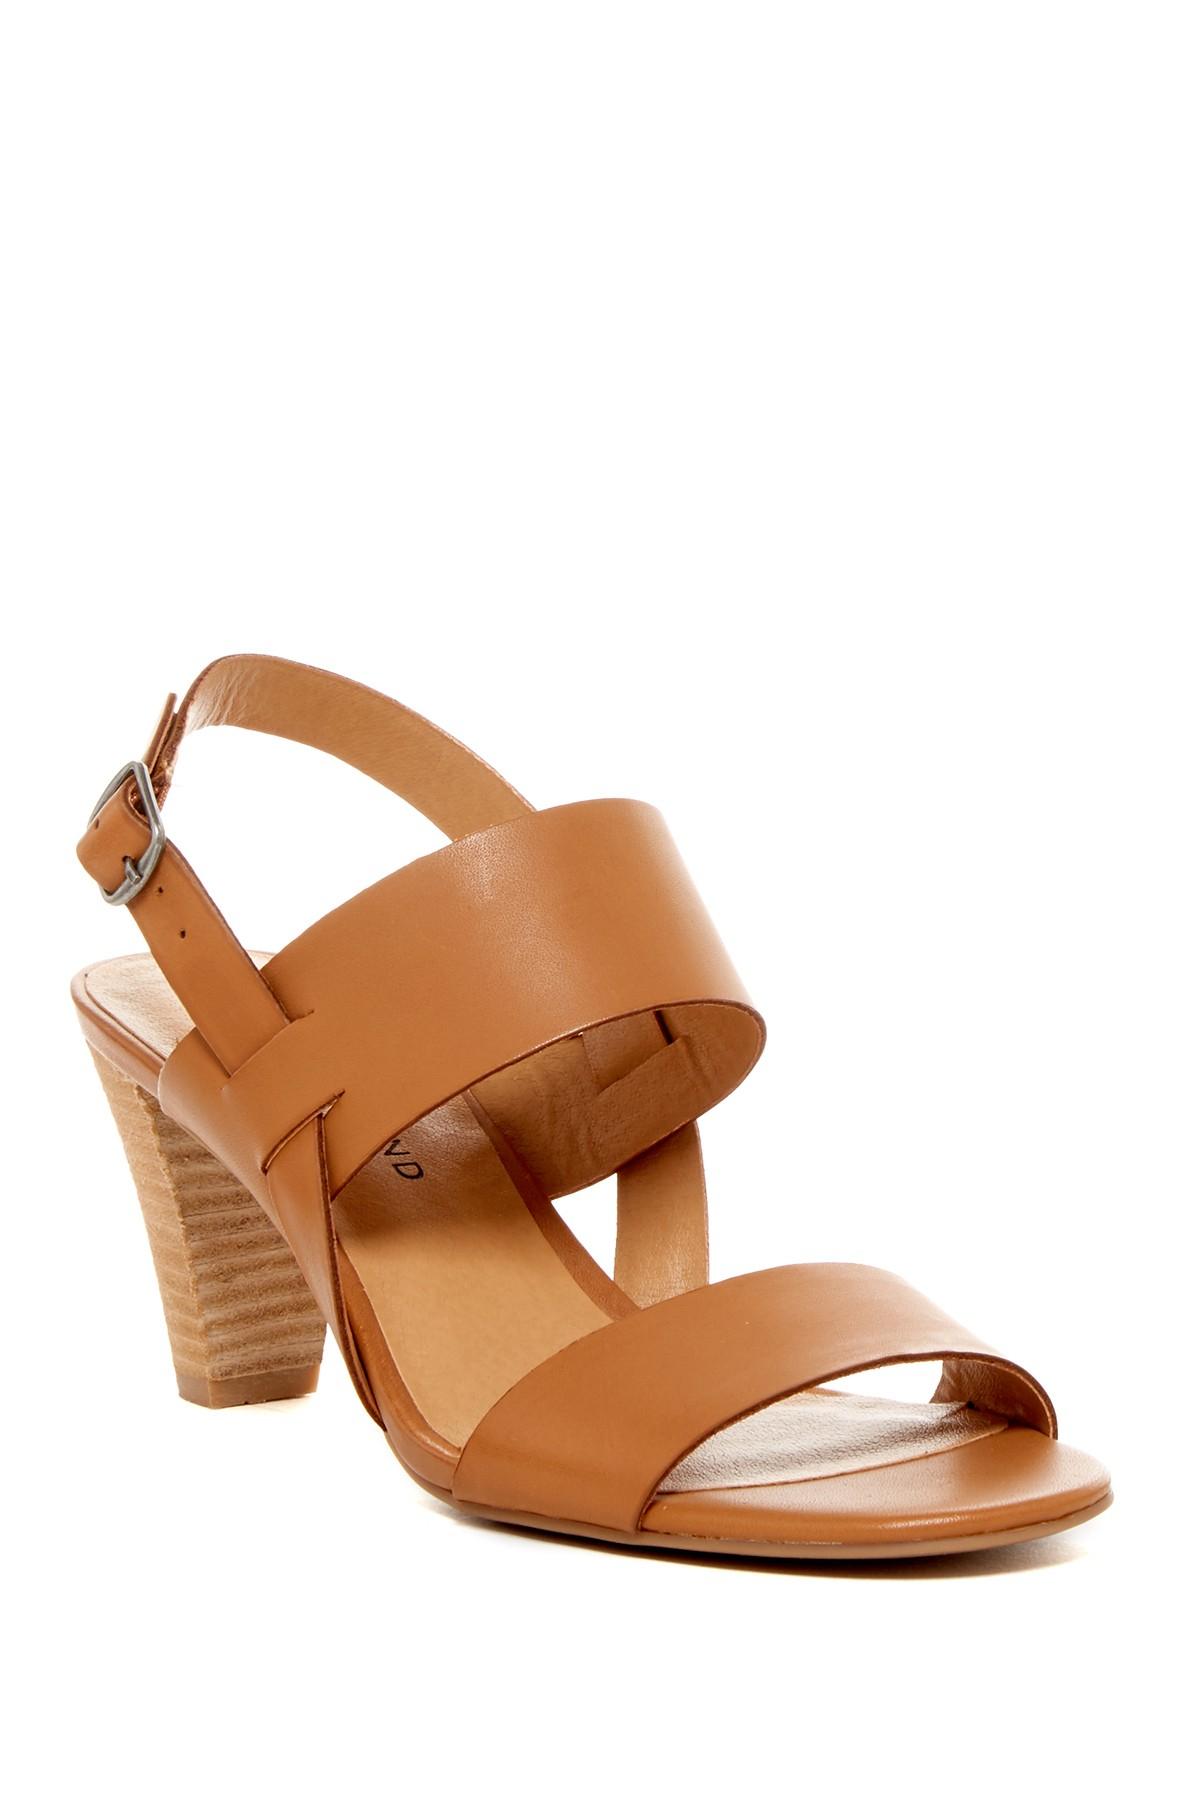 533997d9a21 Lyst - Lucky Brand Patie Heel Sandal in Brown